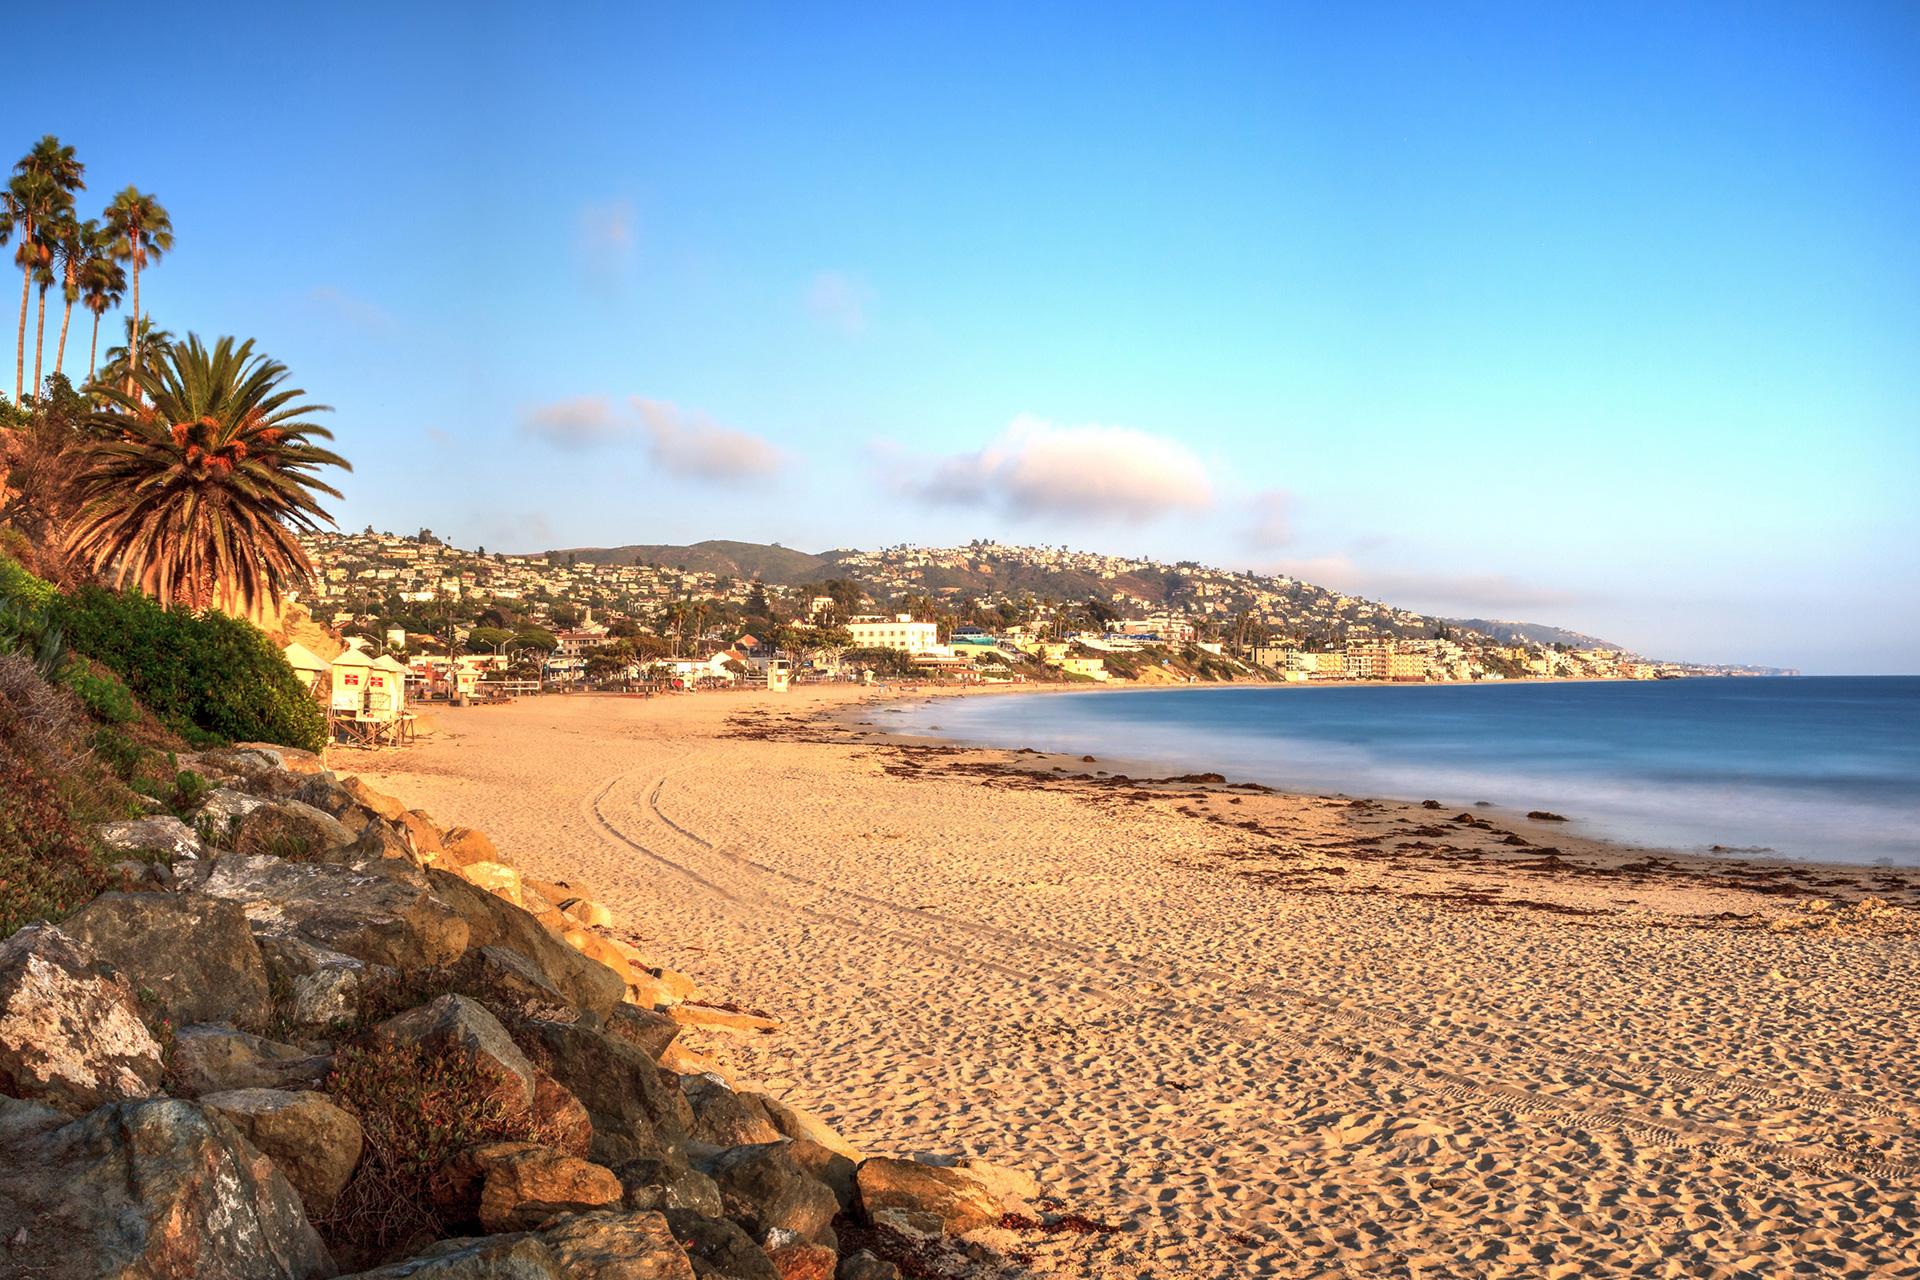 Golden Hour over the ocean at Main Beach in Laguna Beach, California; Courtesy of LagunaticPhoto/Shutterstock